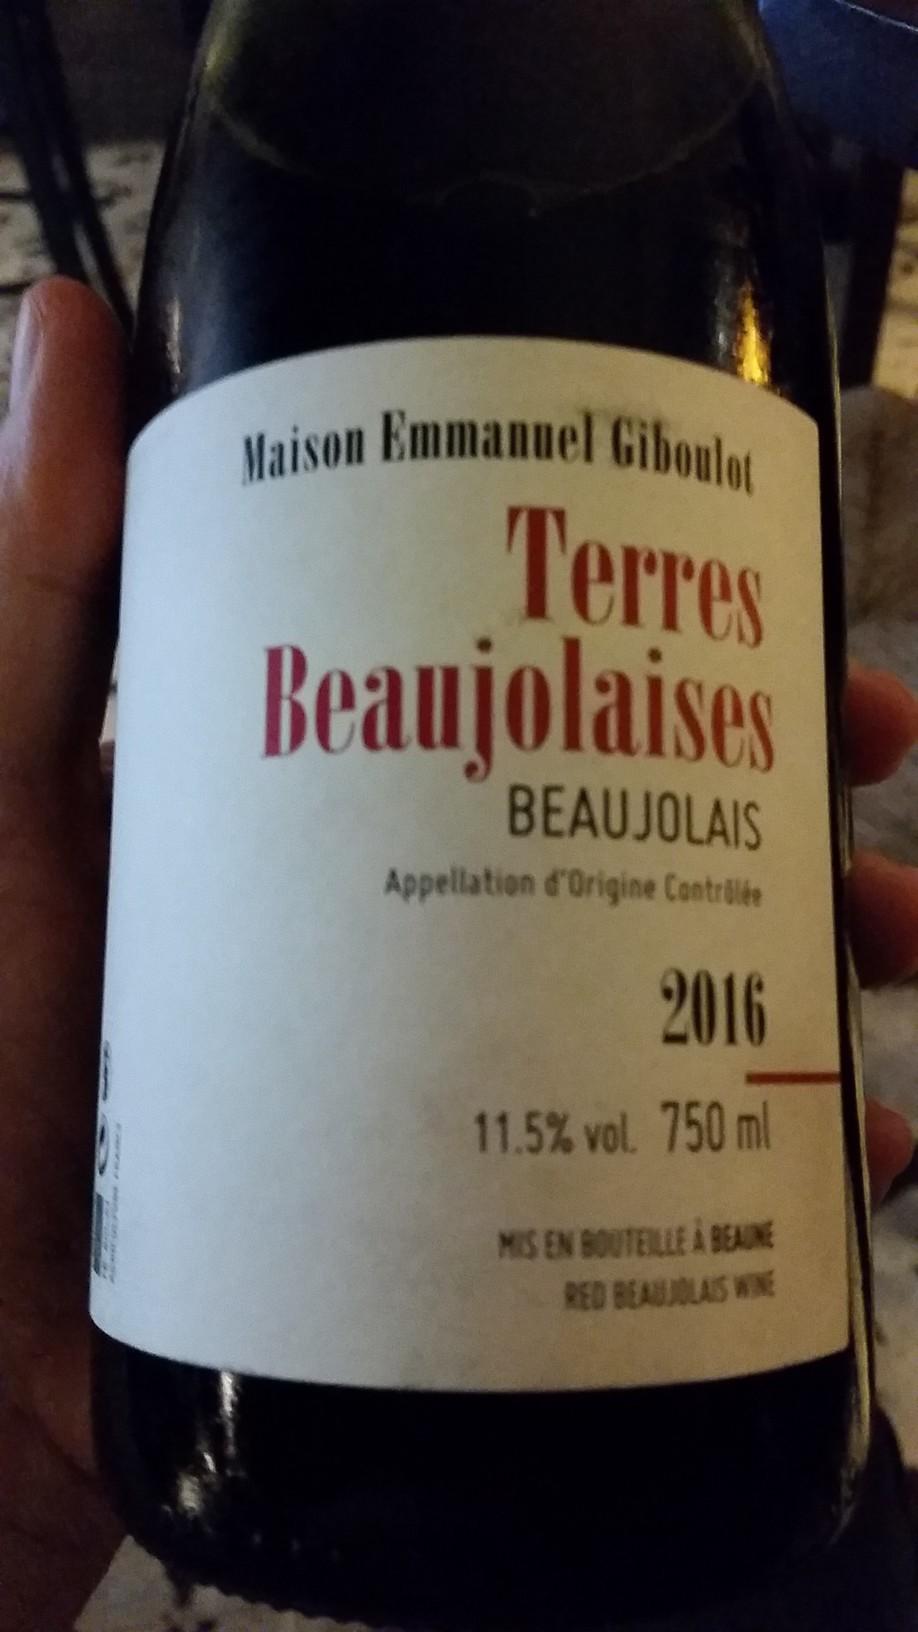 Emmanuel Giboulot - Terres Beaujolaises 2016